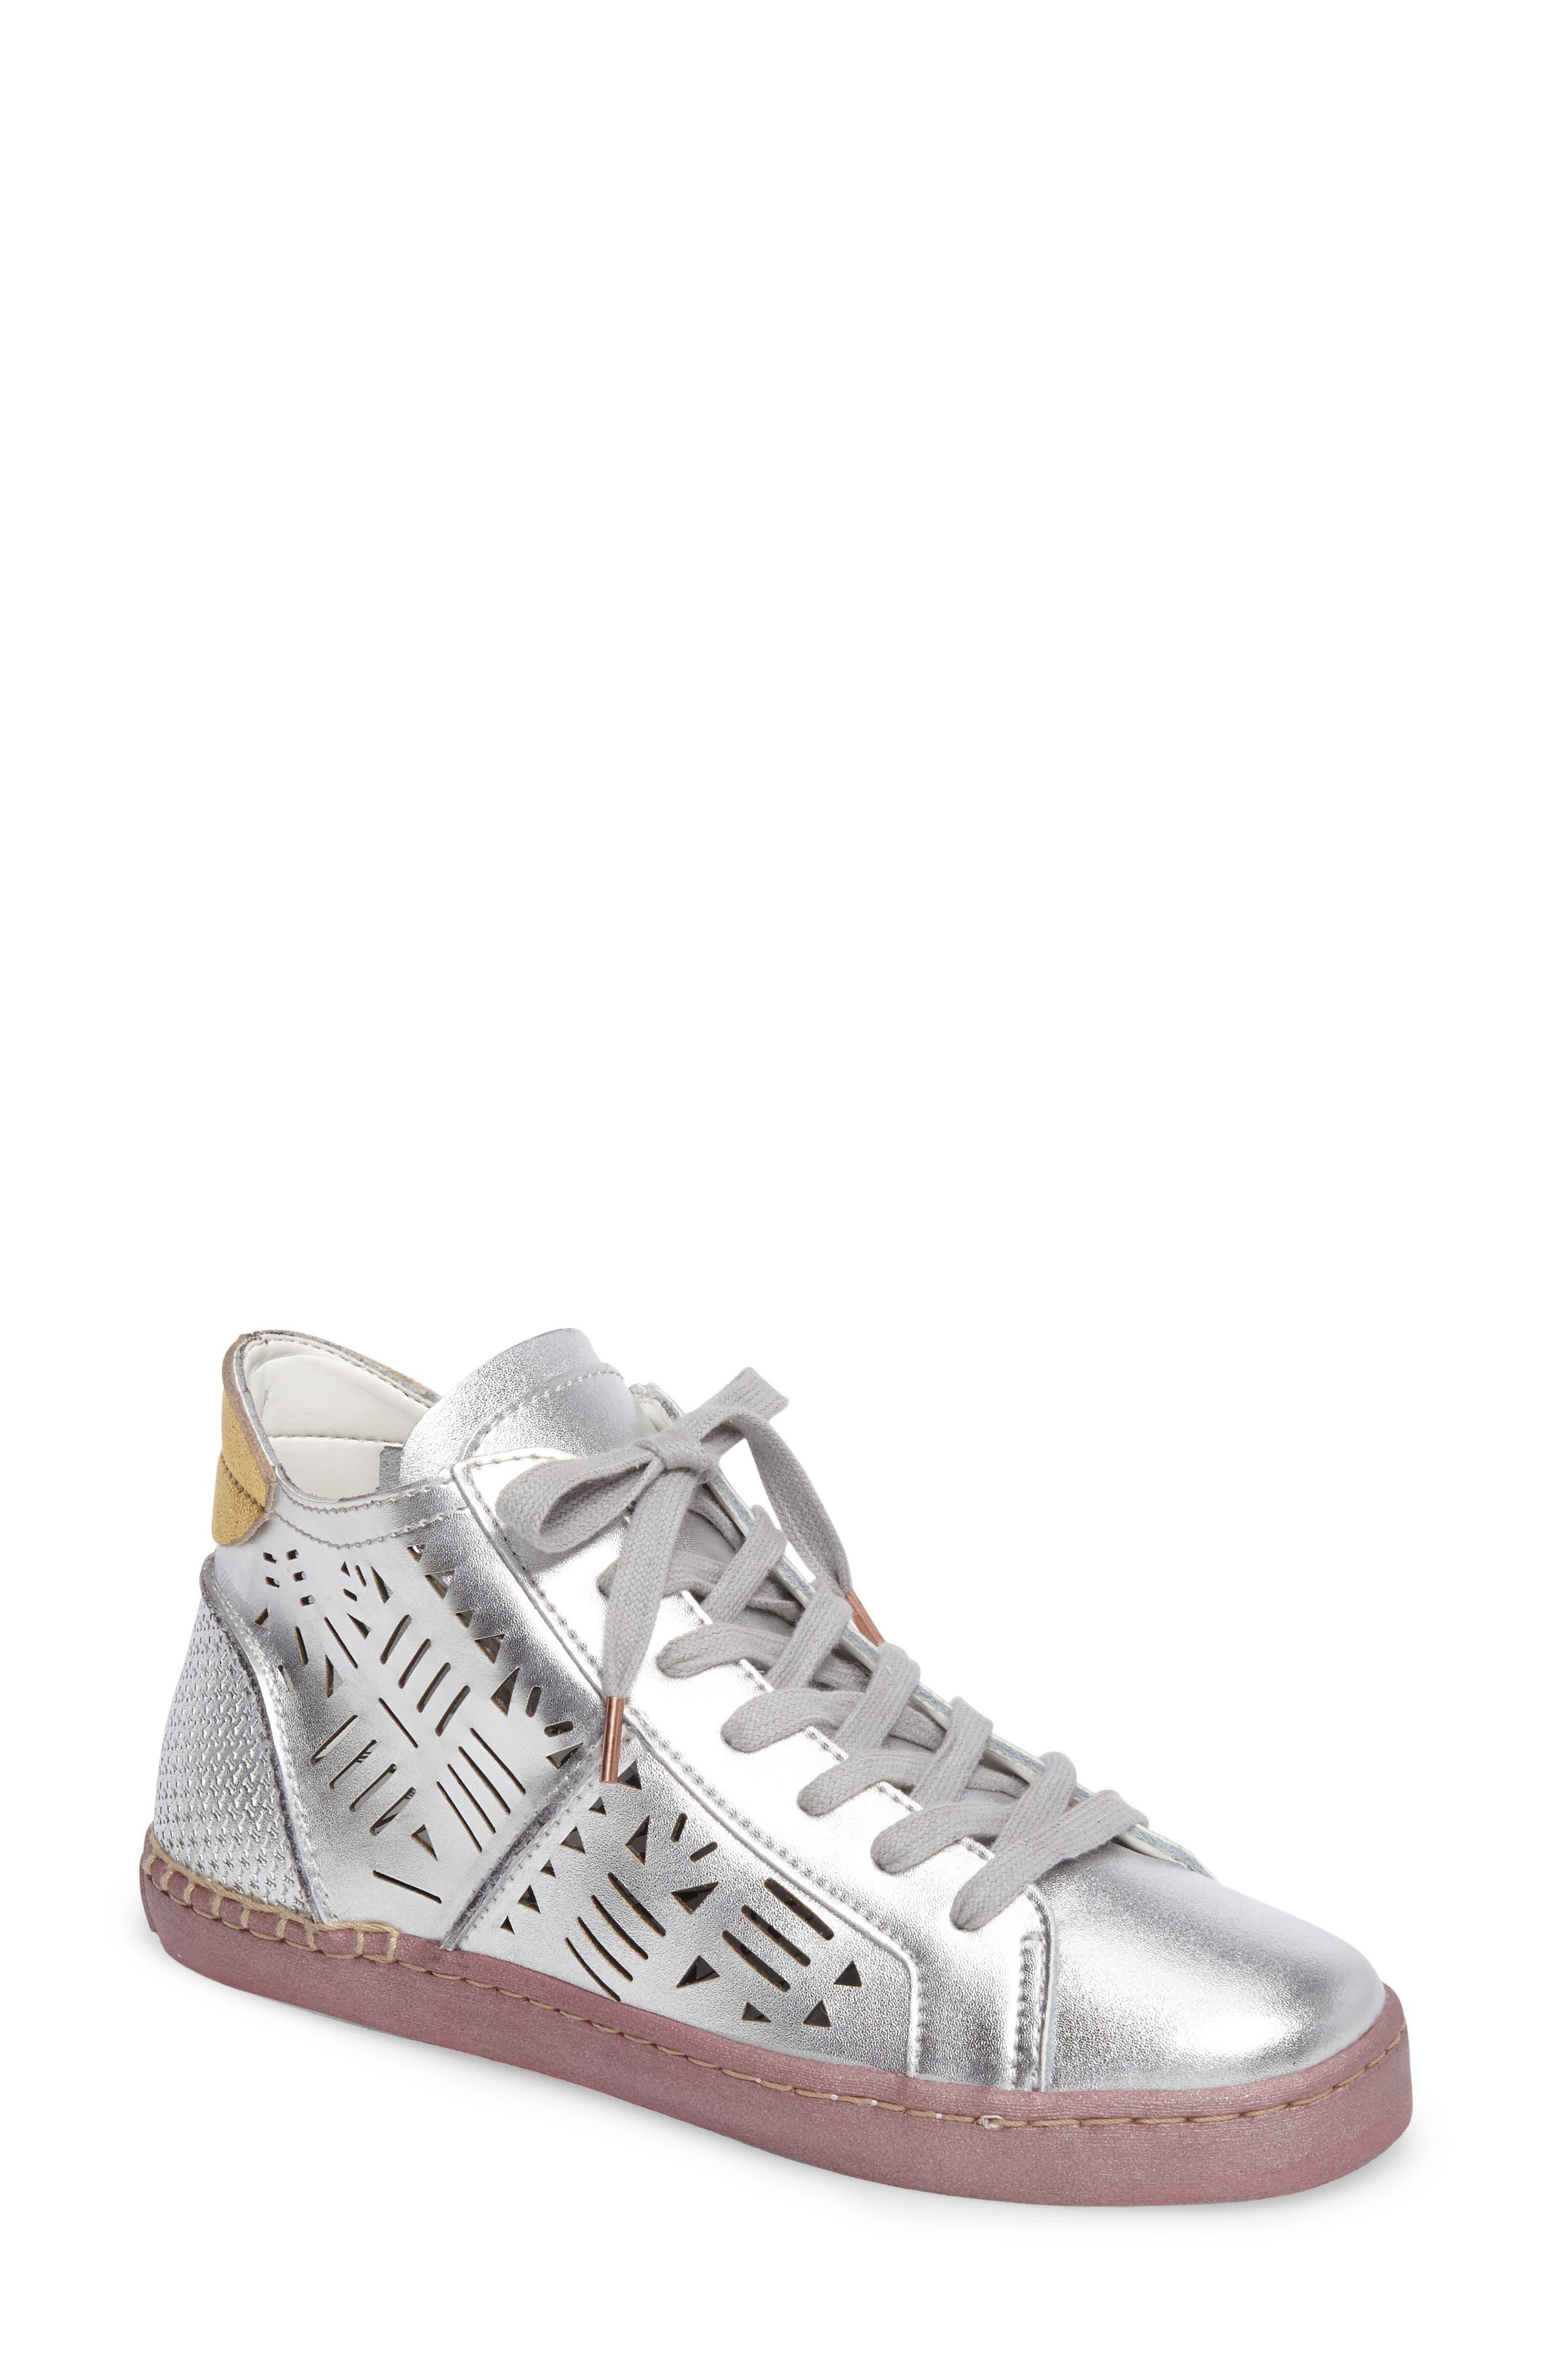 Main Image - Dolce Vita Zeus Sneaker (Women)